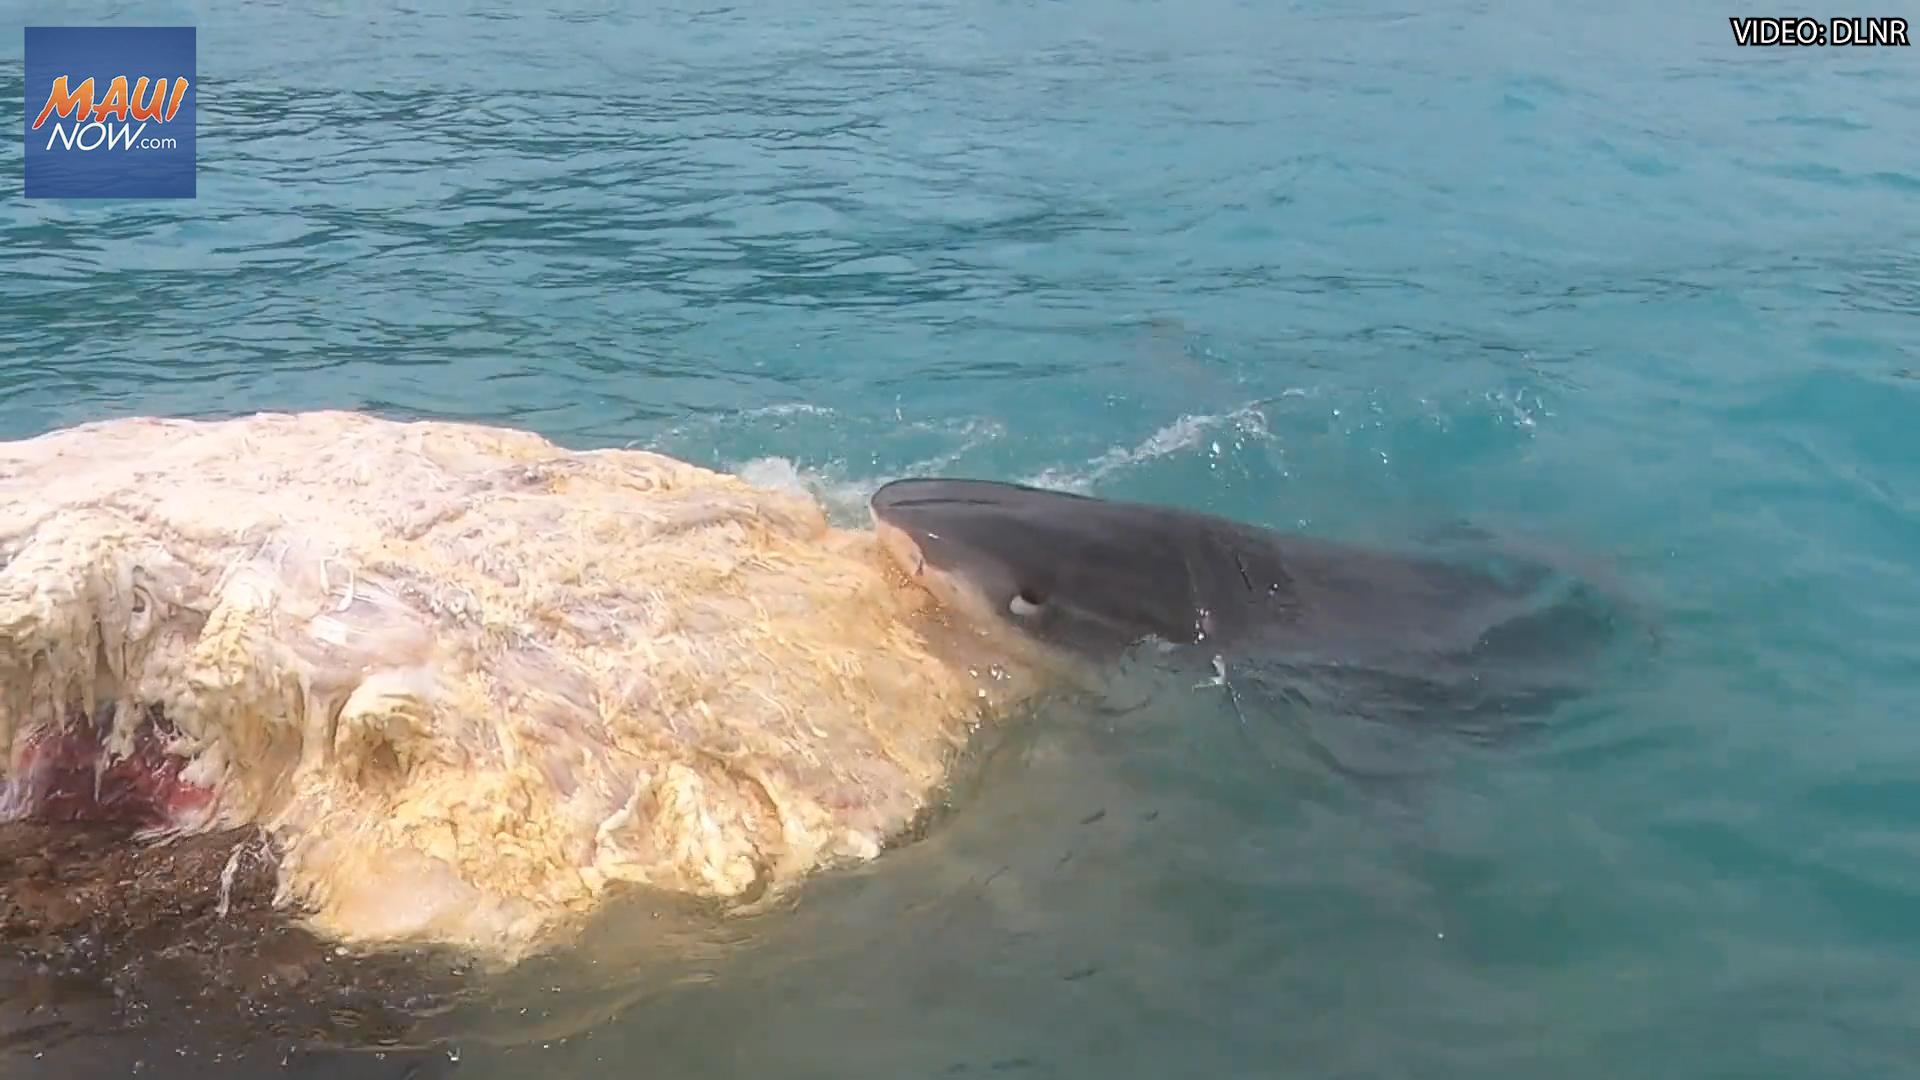 VIDEO: Tiger Sharks Feeding on Whale Carcass Off-Shore From Waimānalo